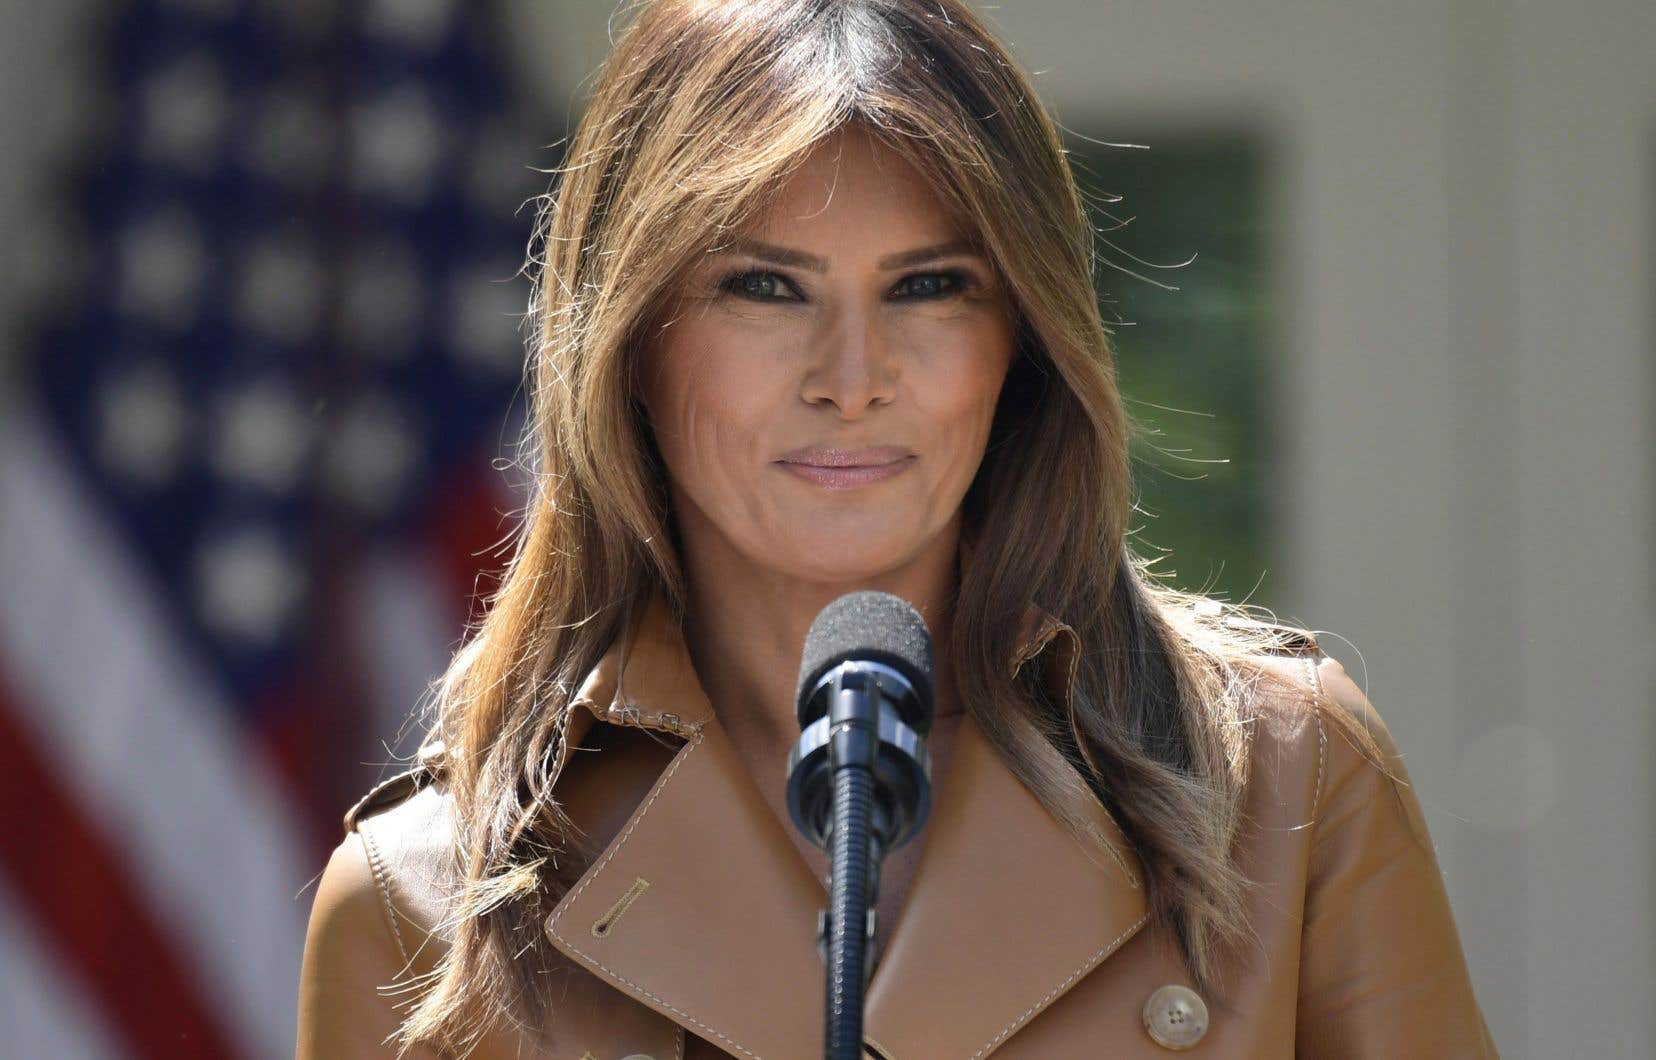 La Première dame américaine, Melania Trump